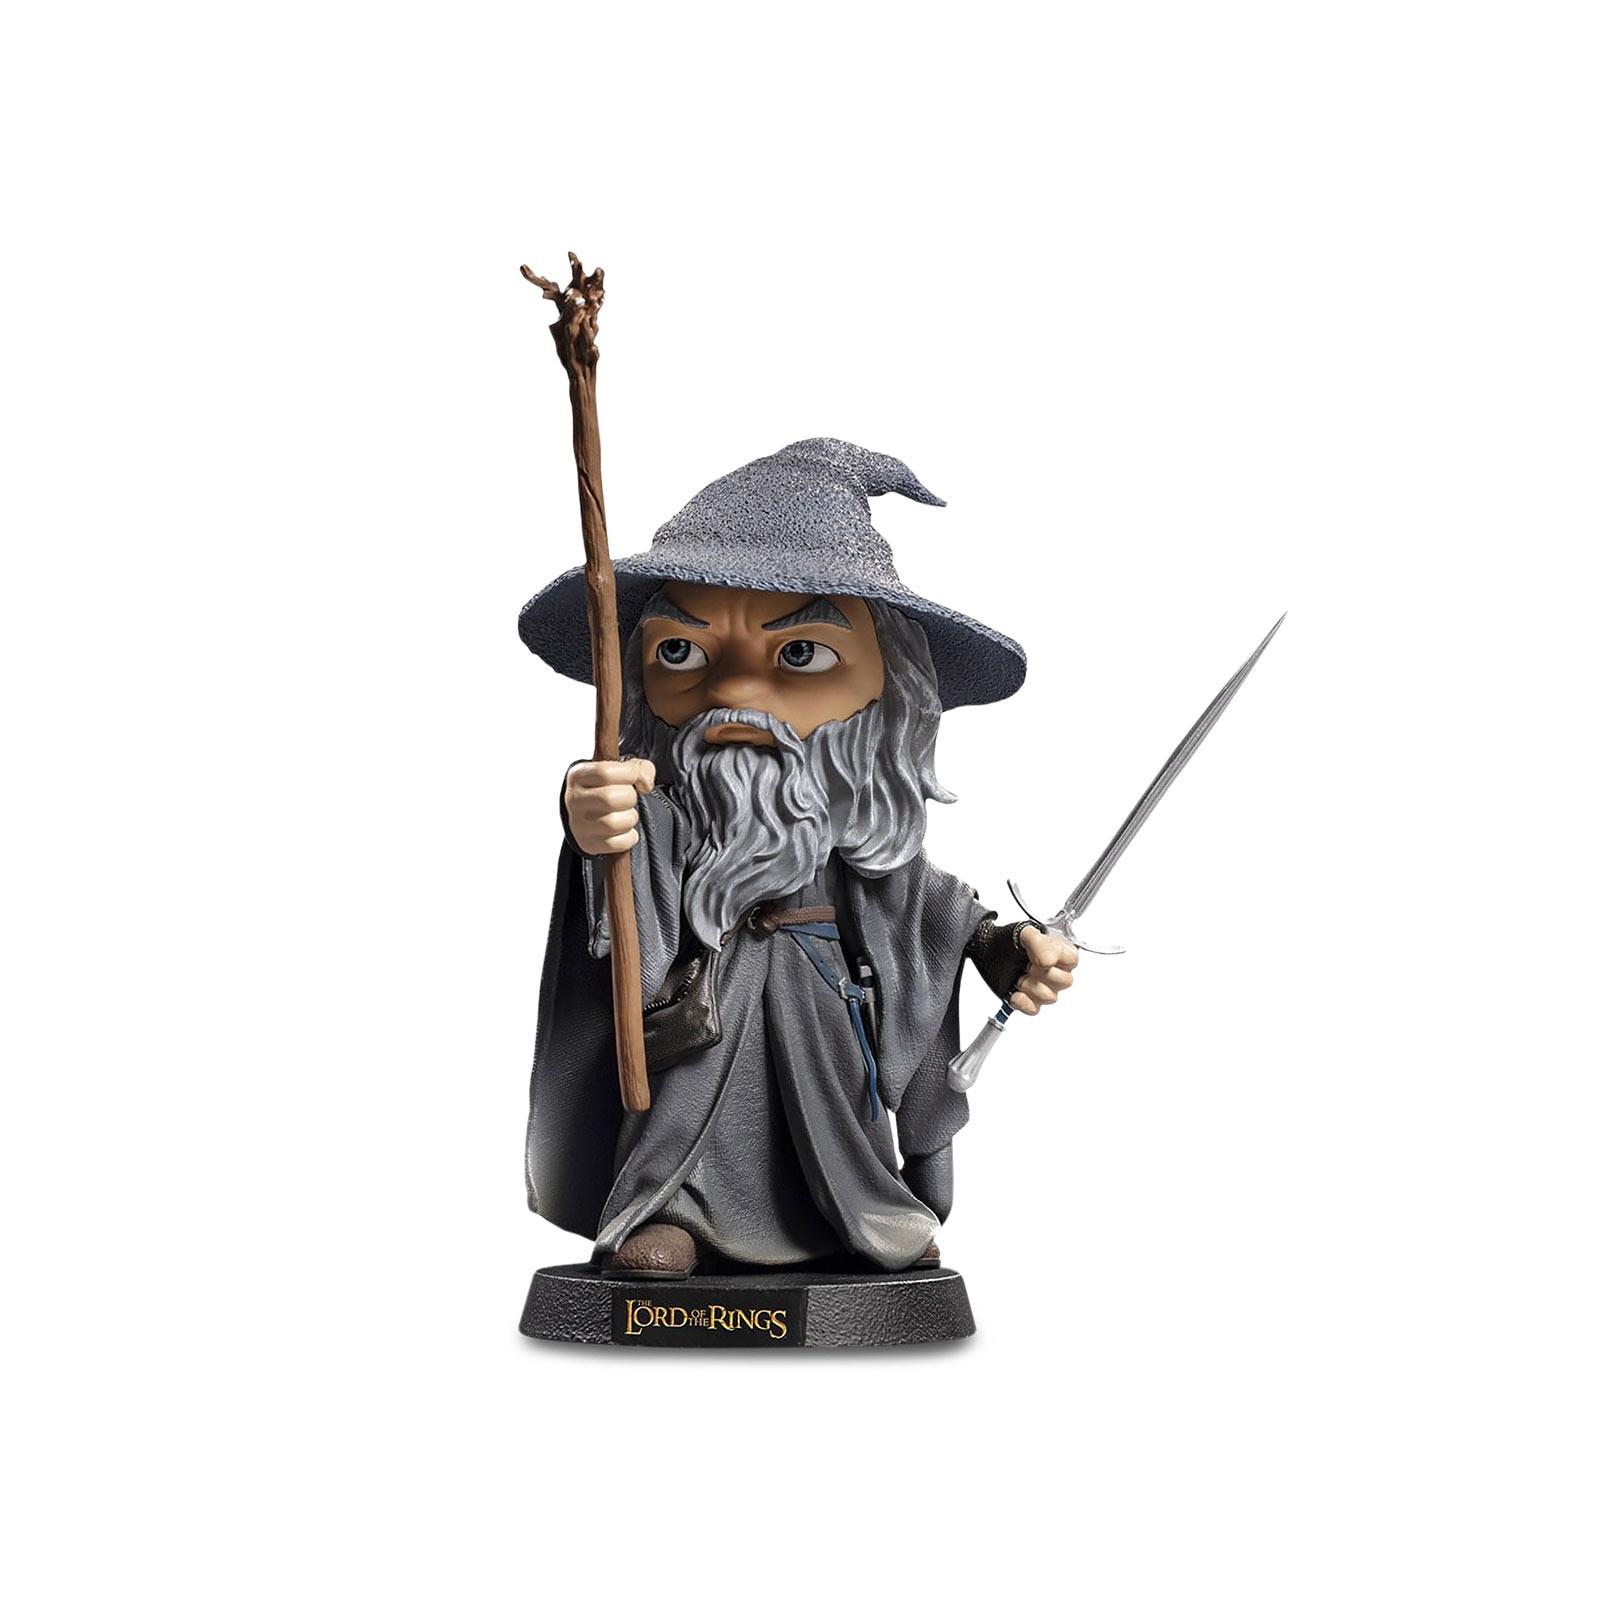 Herr der Ringe - Gandalf Minico Figur